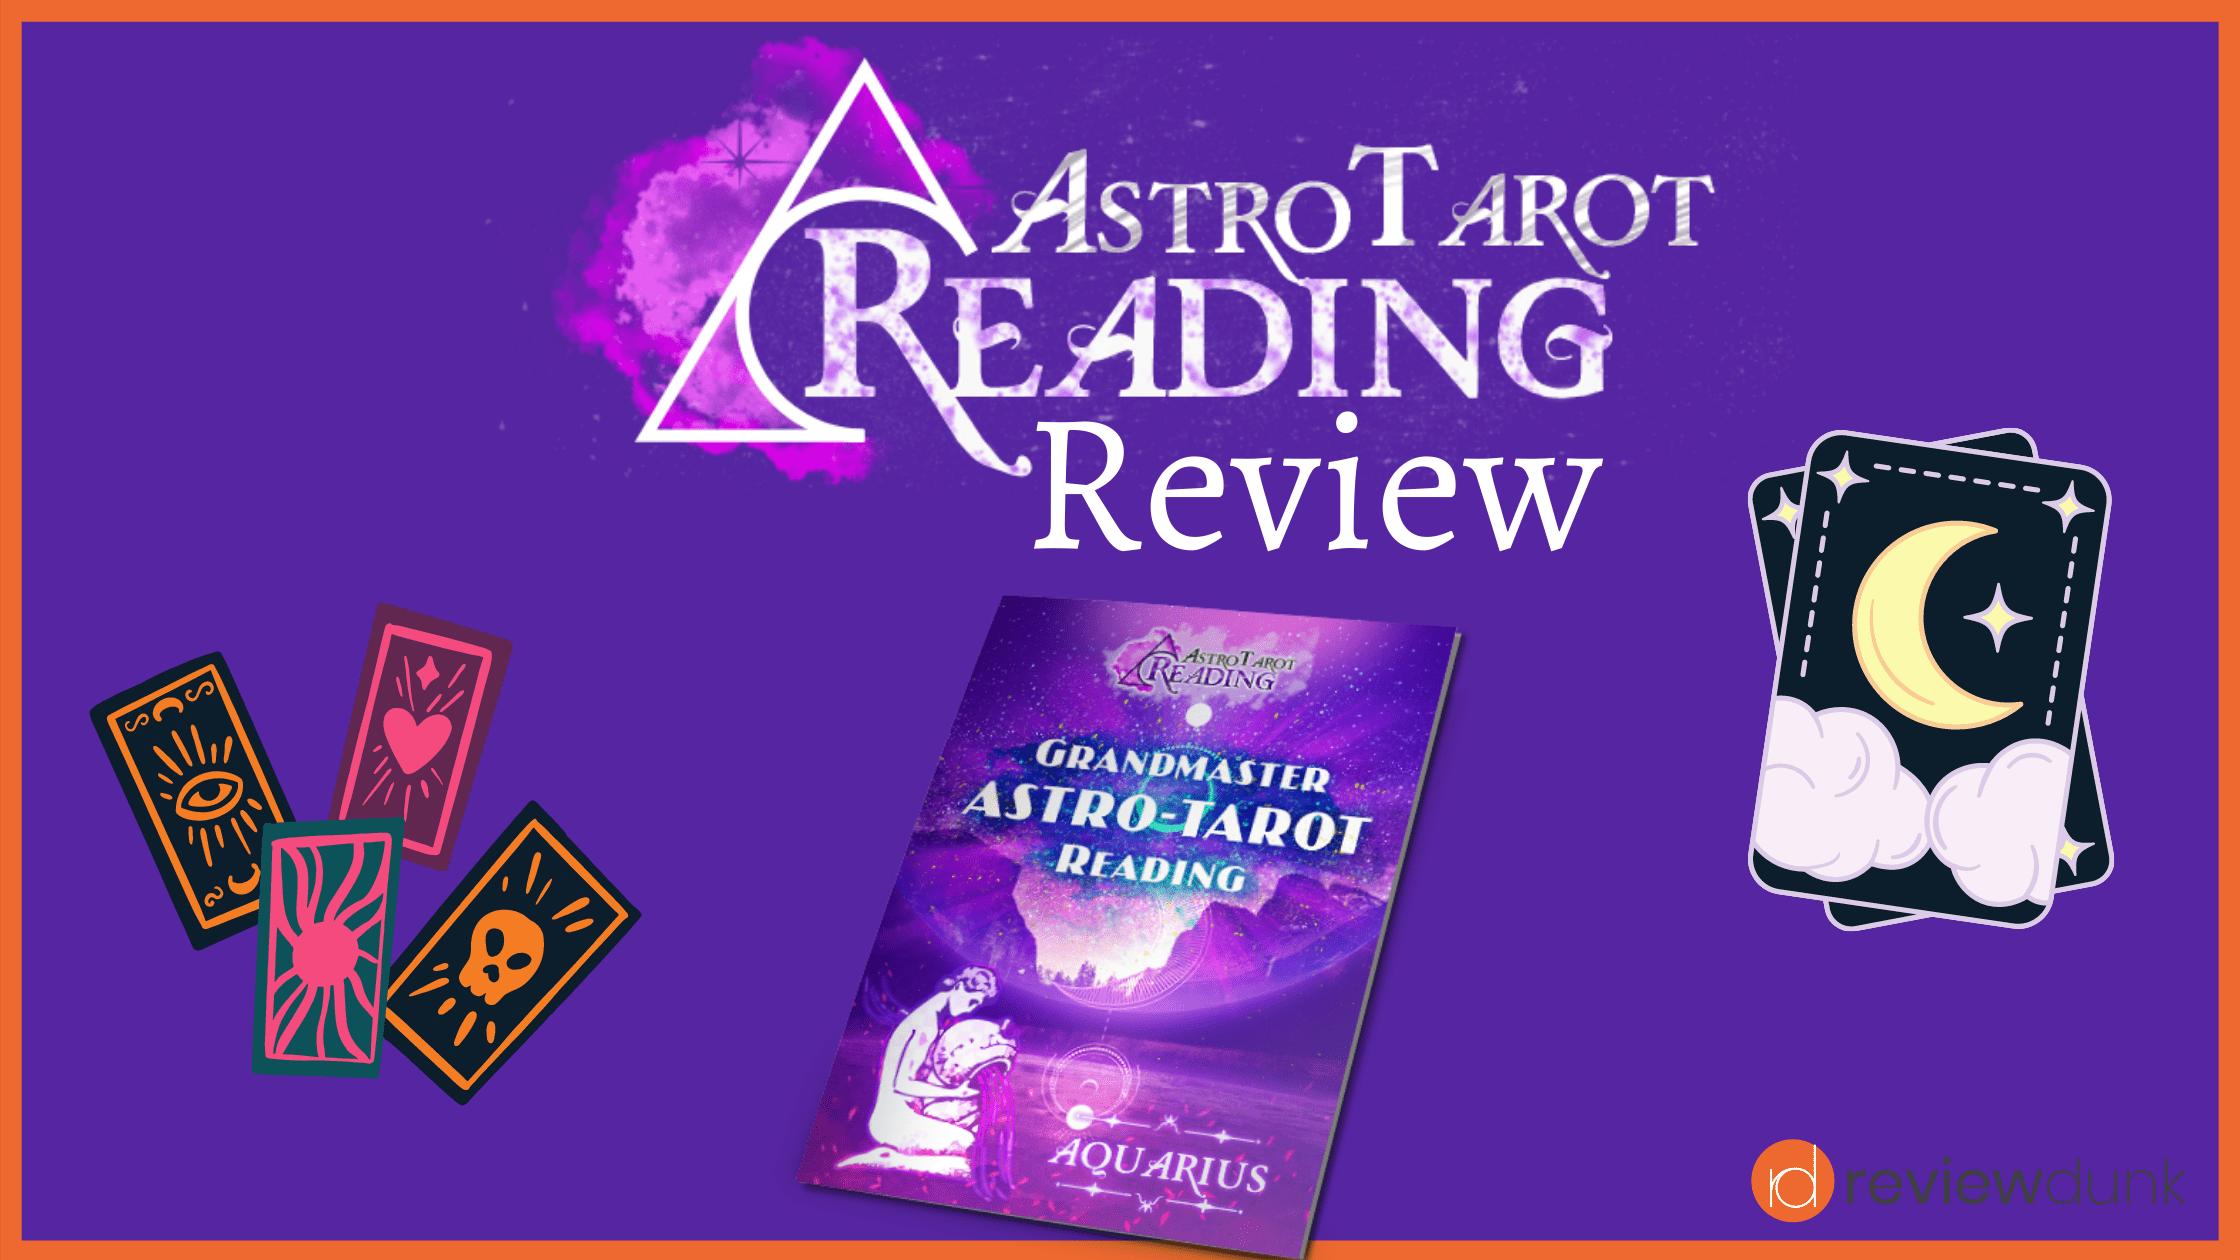 Astro-Tarot-Reading-Review